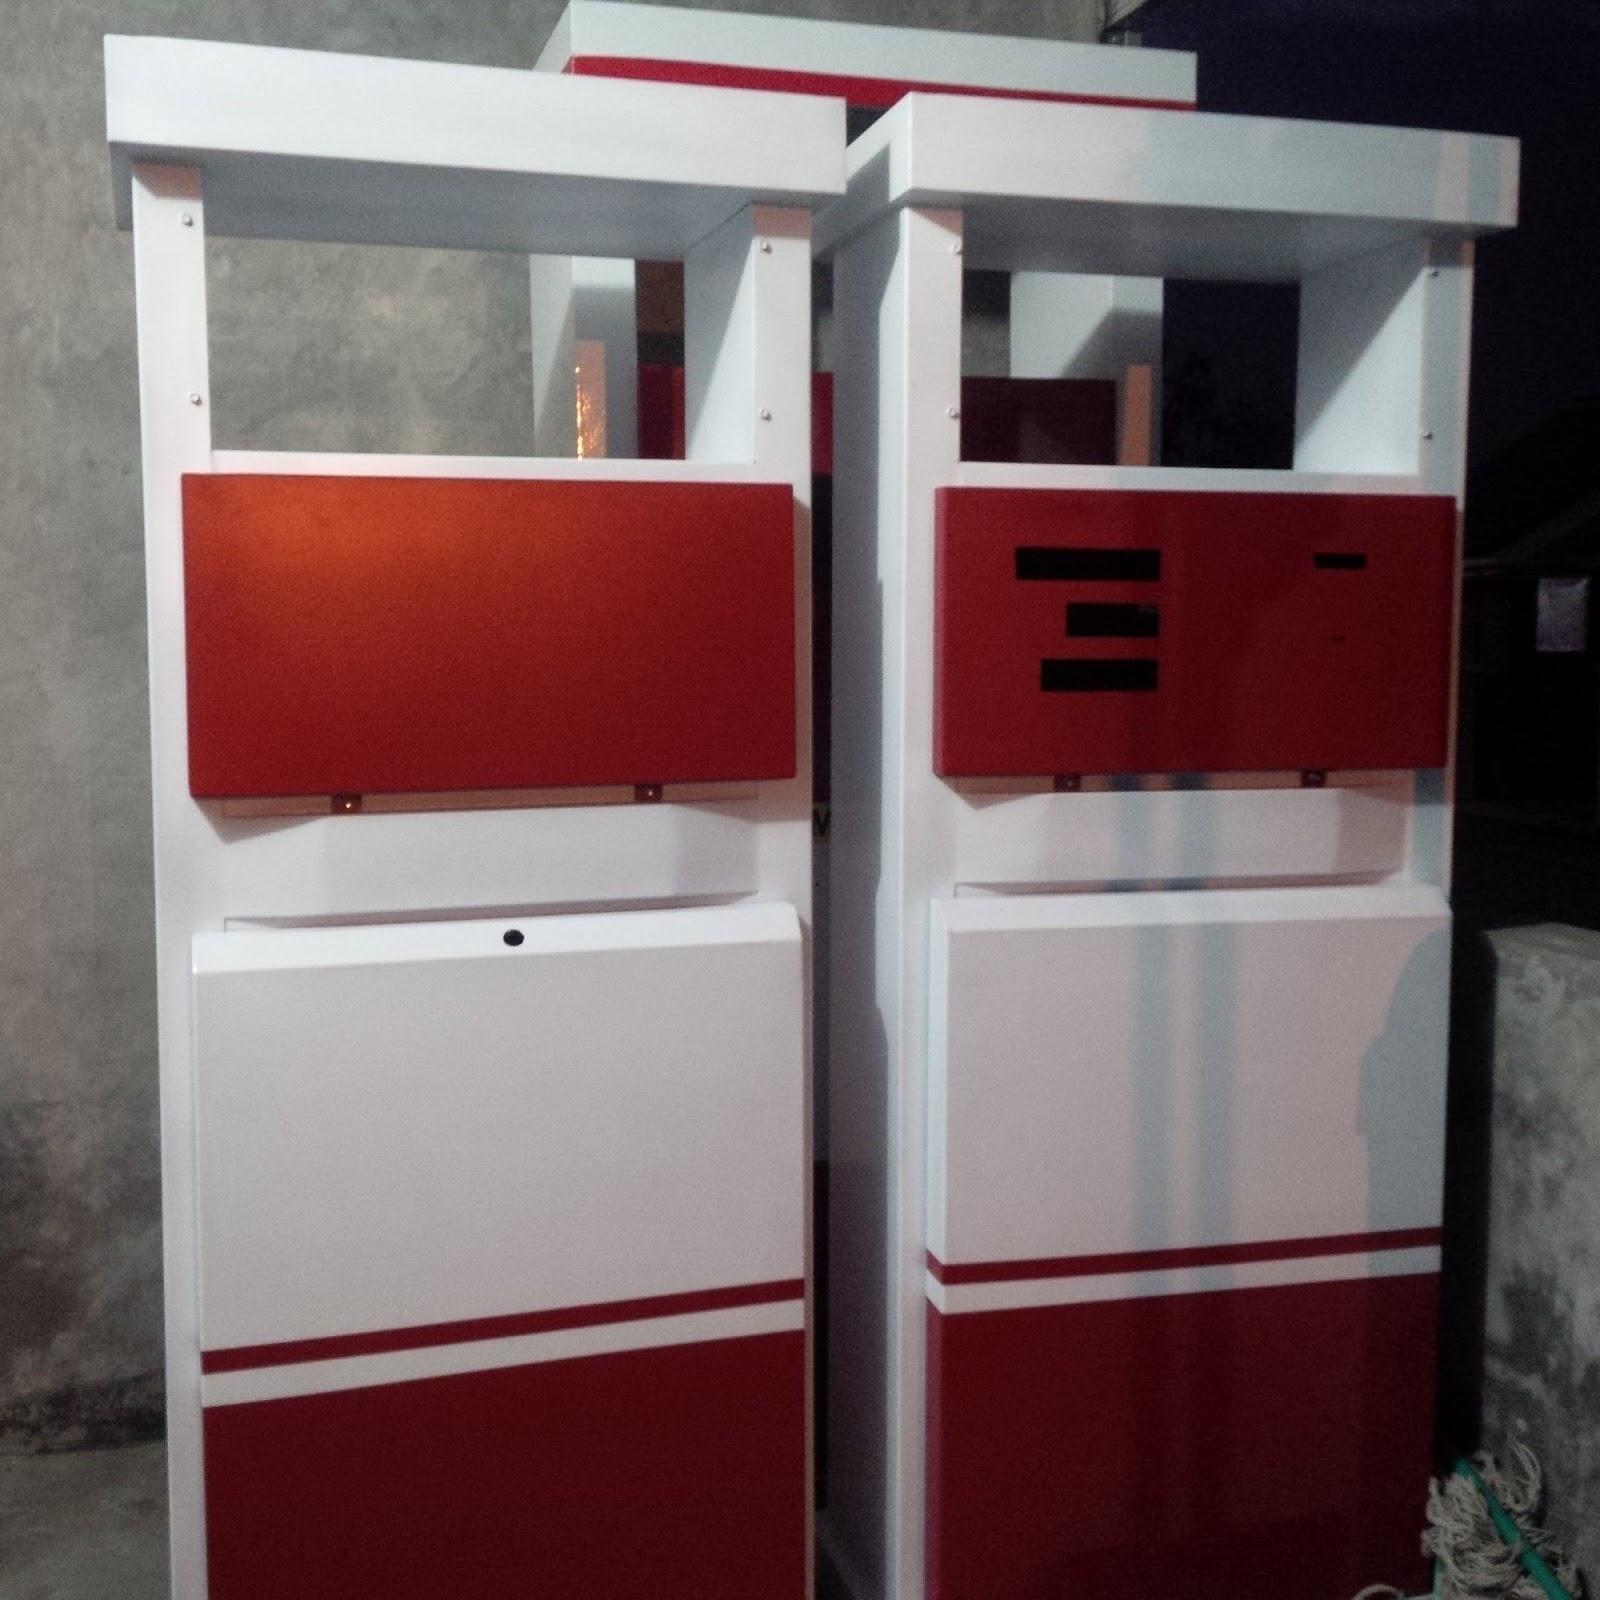 Update Harga Casing Rangka Box Mesin Pom Pertamini Digital Murah Cashing  Terbaik Mini Izin Bensin